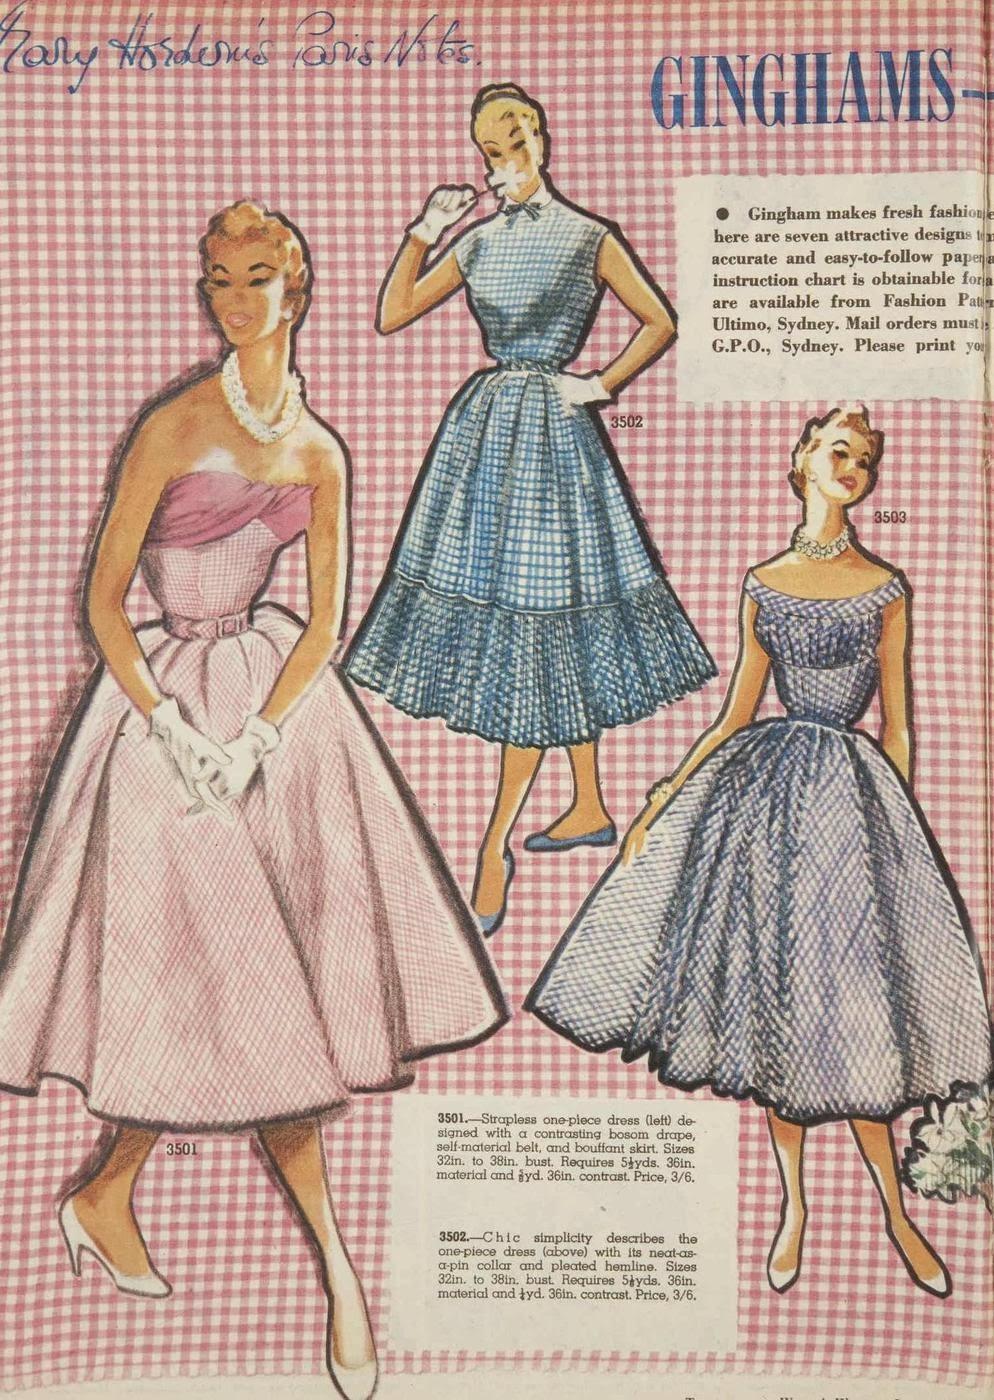 glamorous gingham fashion, 1950s